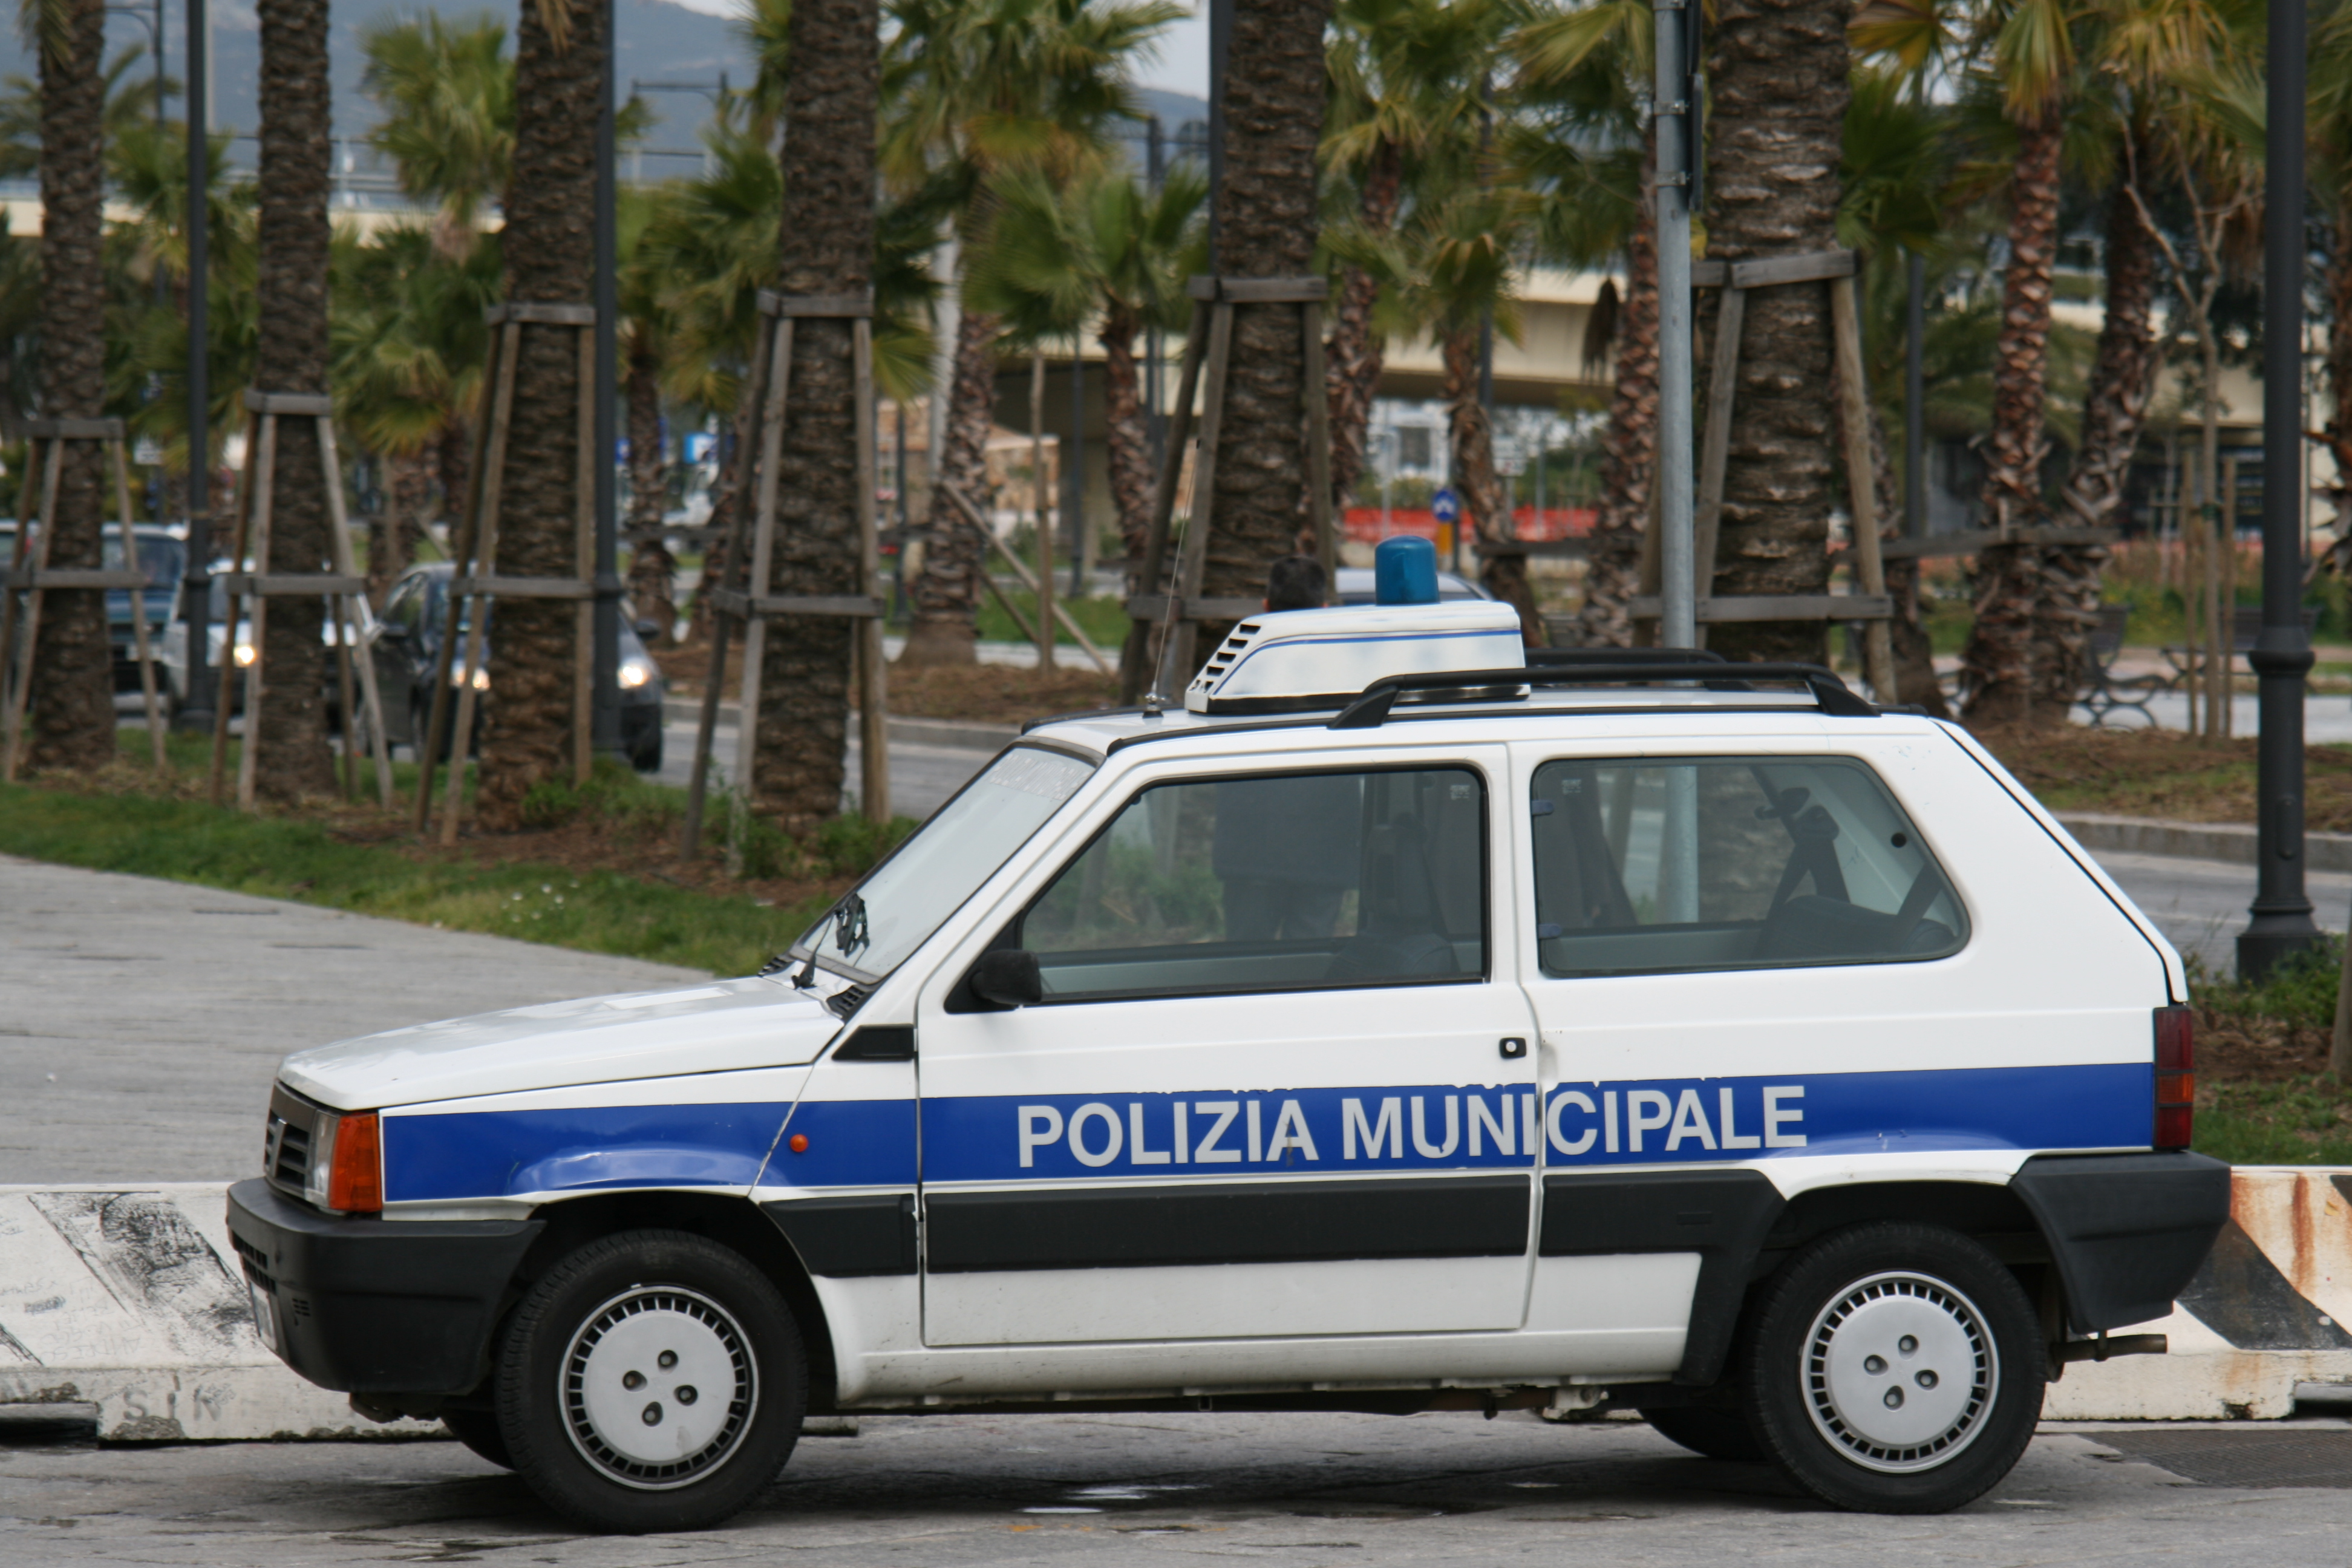 Used Car Police Book